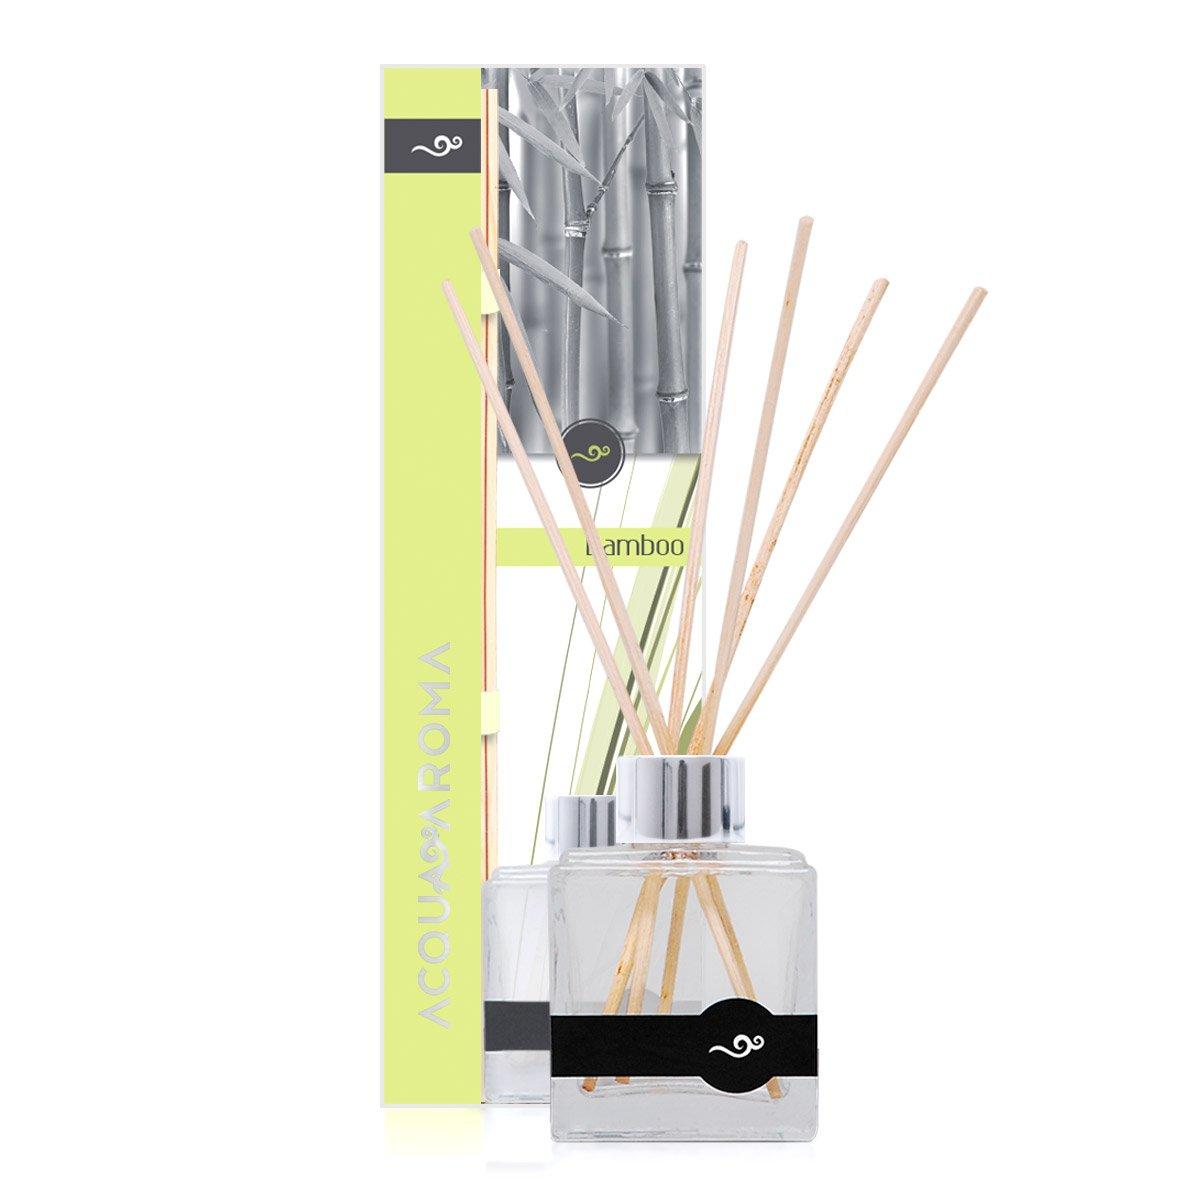 Acqua Aroma Bamboo Reed Diffuser 3.4 FL OZ (100ml)